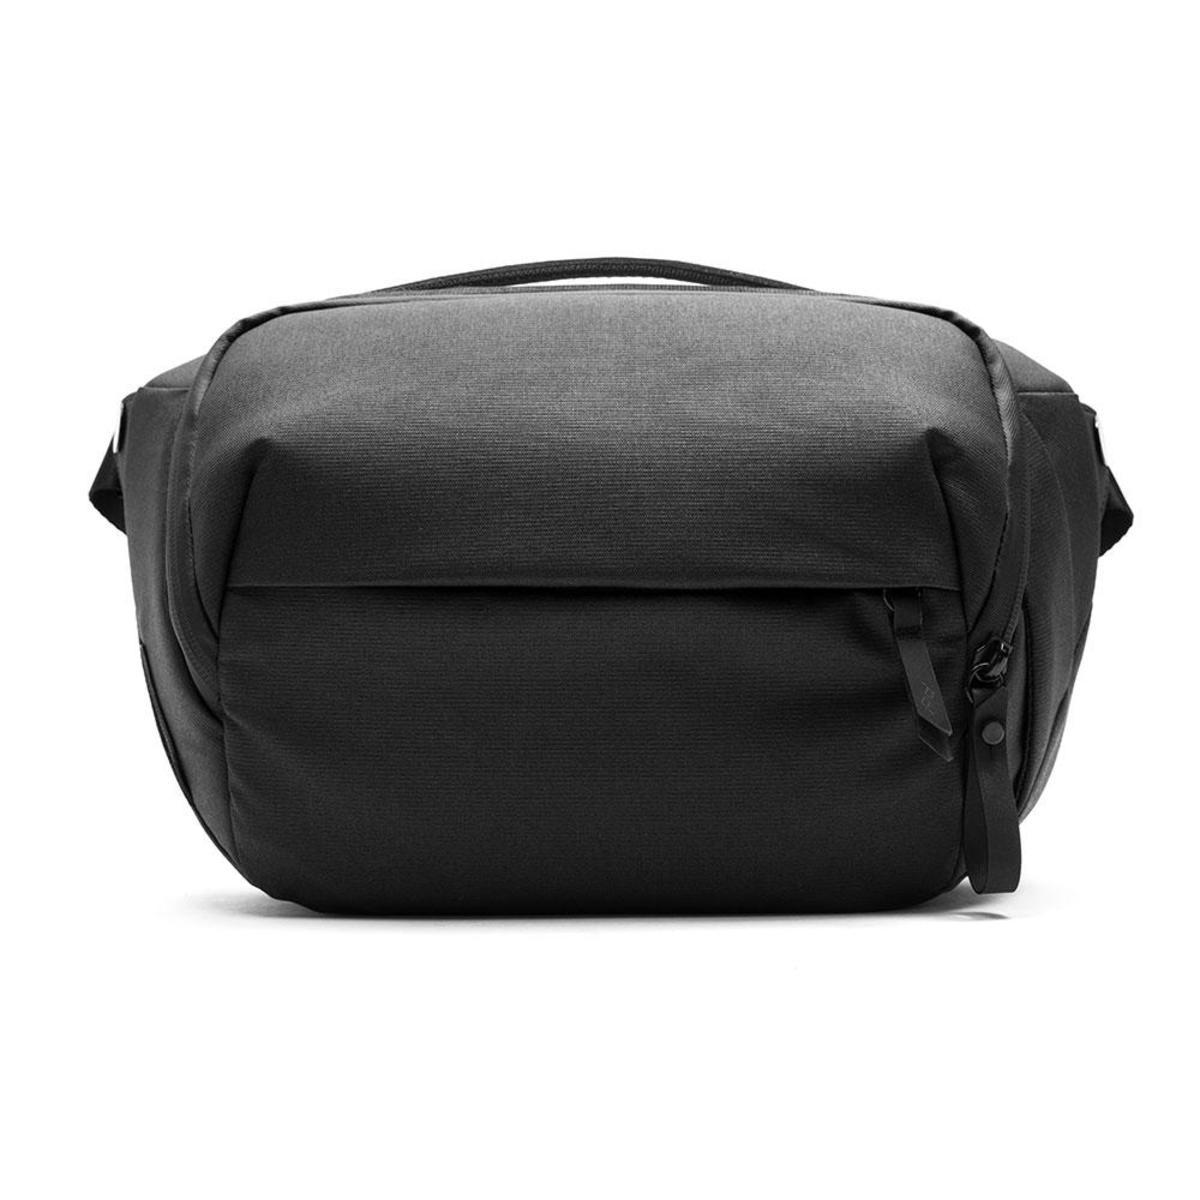 Everyday Sling 5L(Black) (Authorized goods)